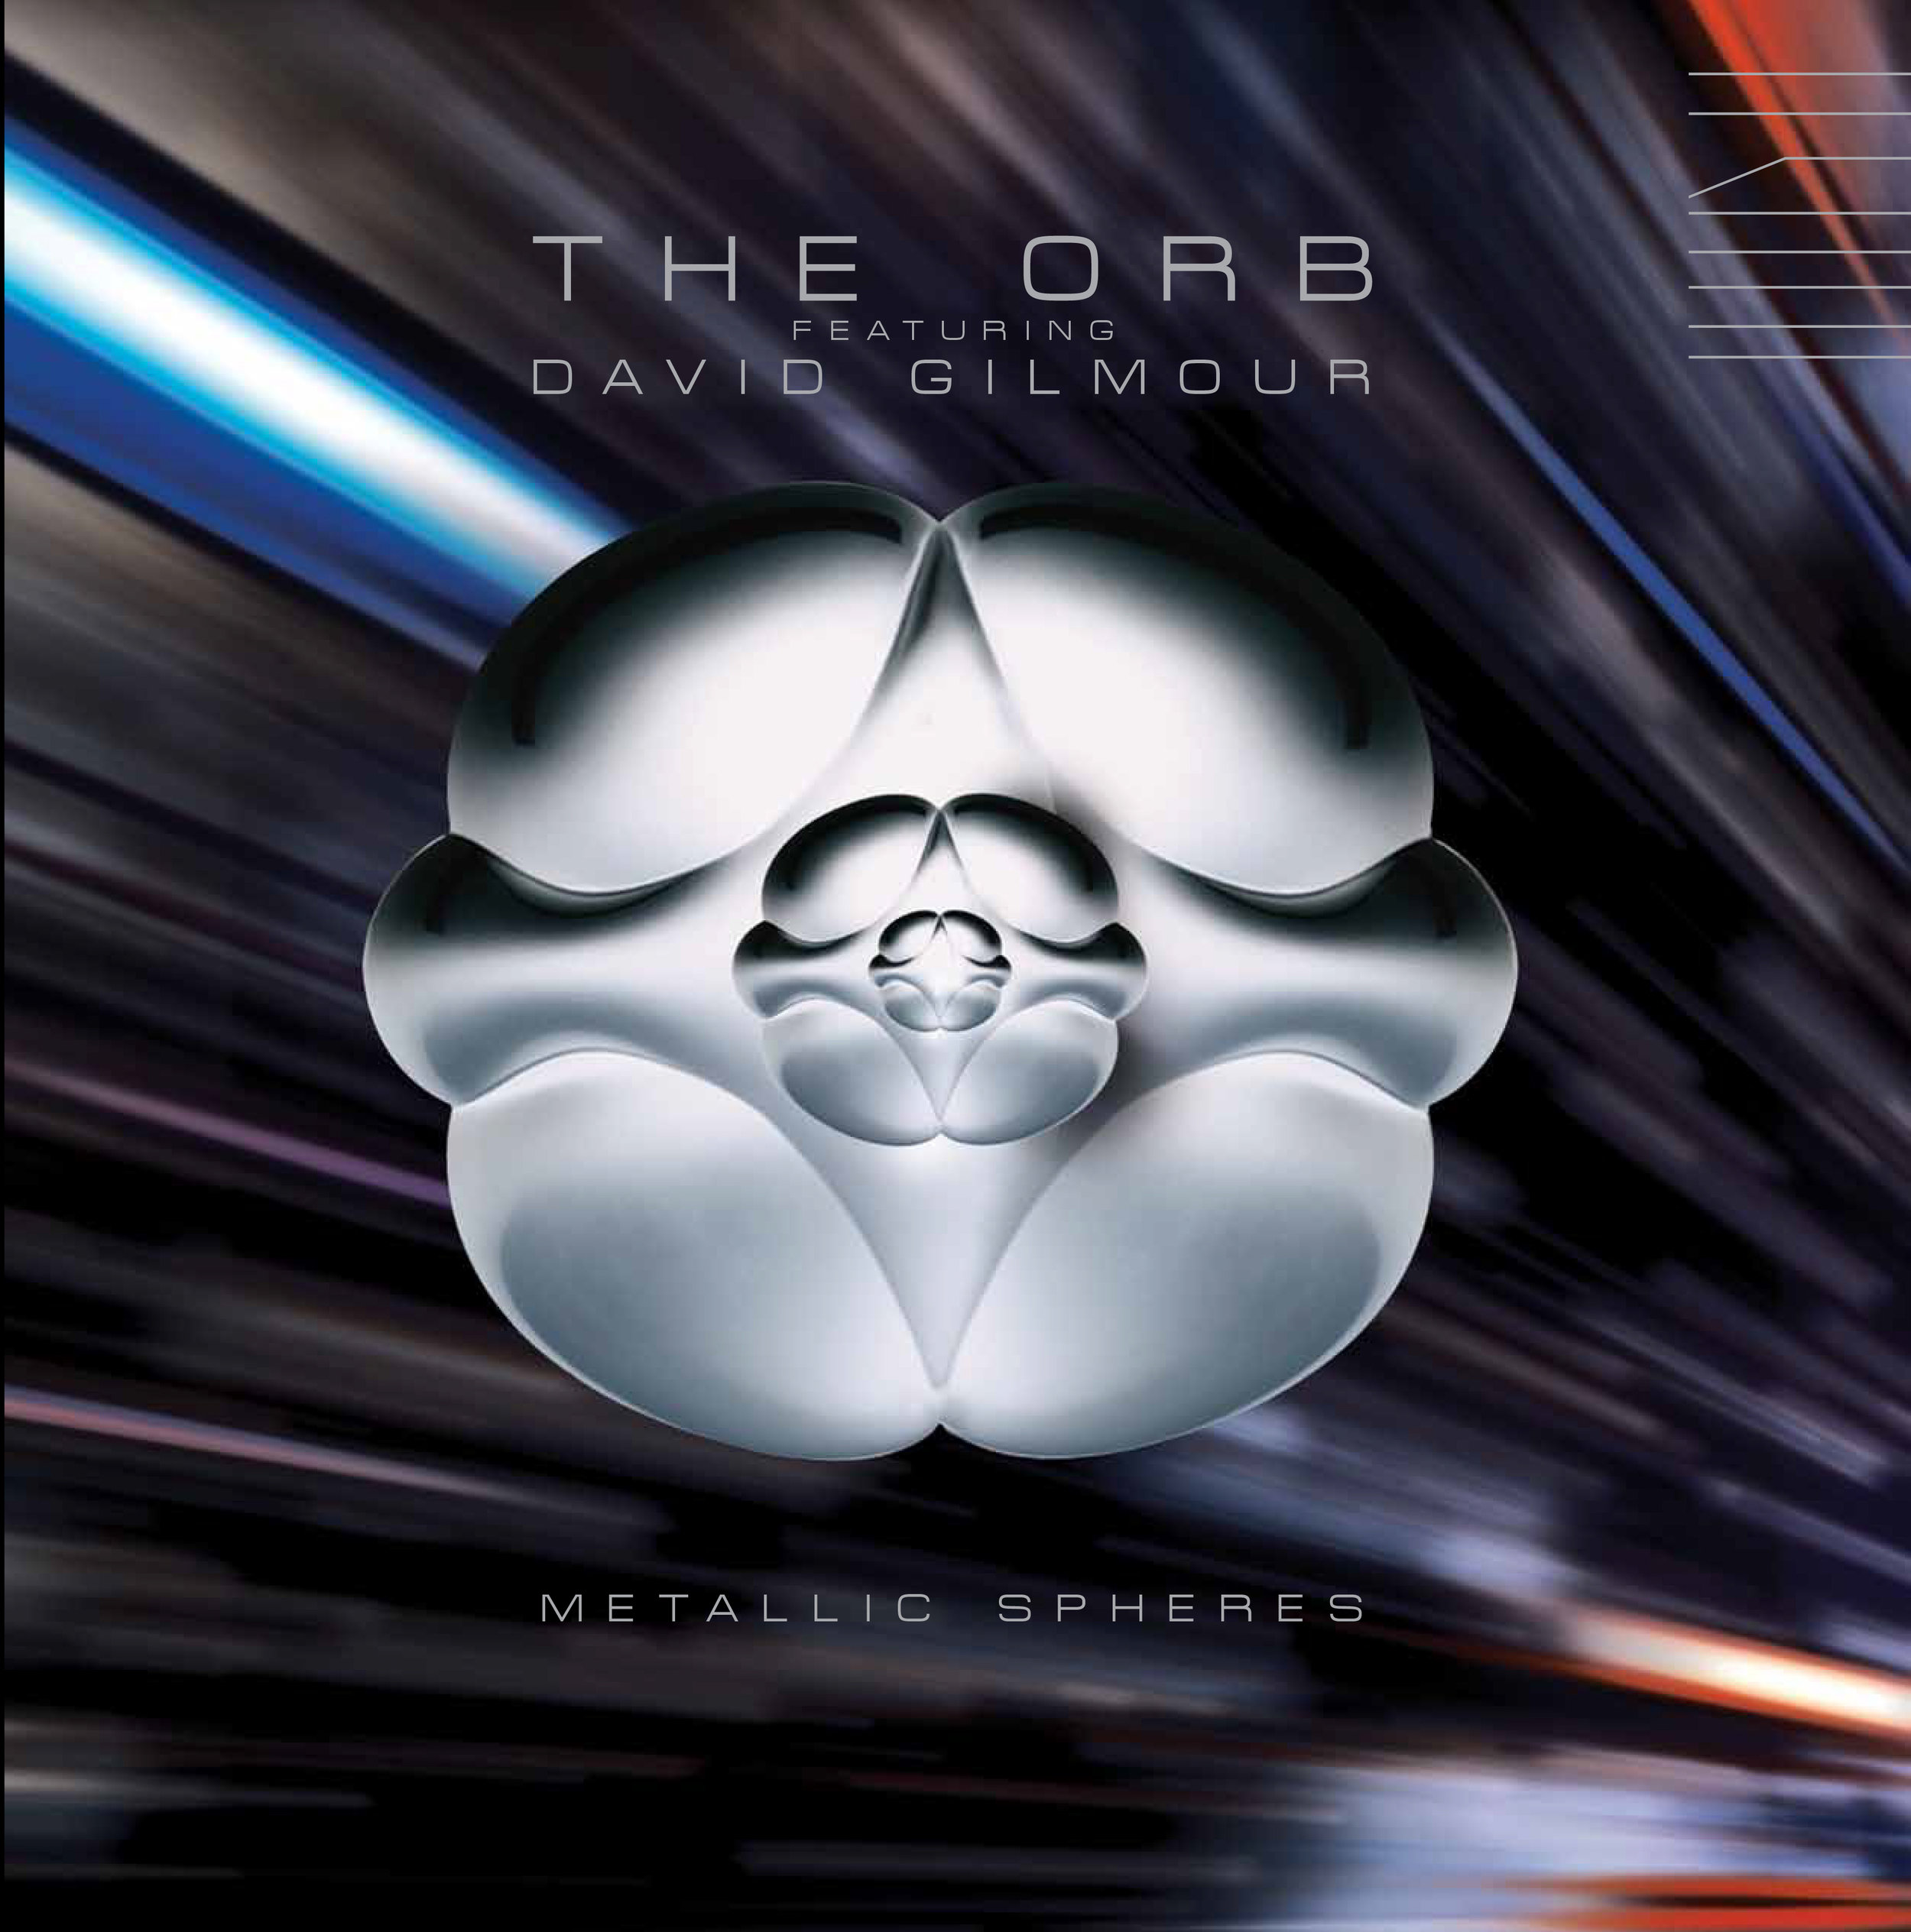 The Orb - Metallic Spheres LP version - SONY 2012